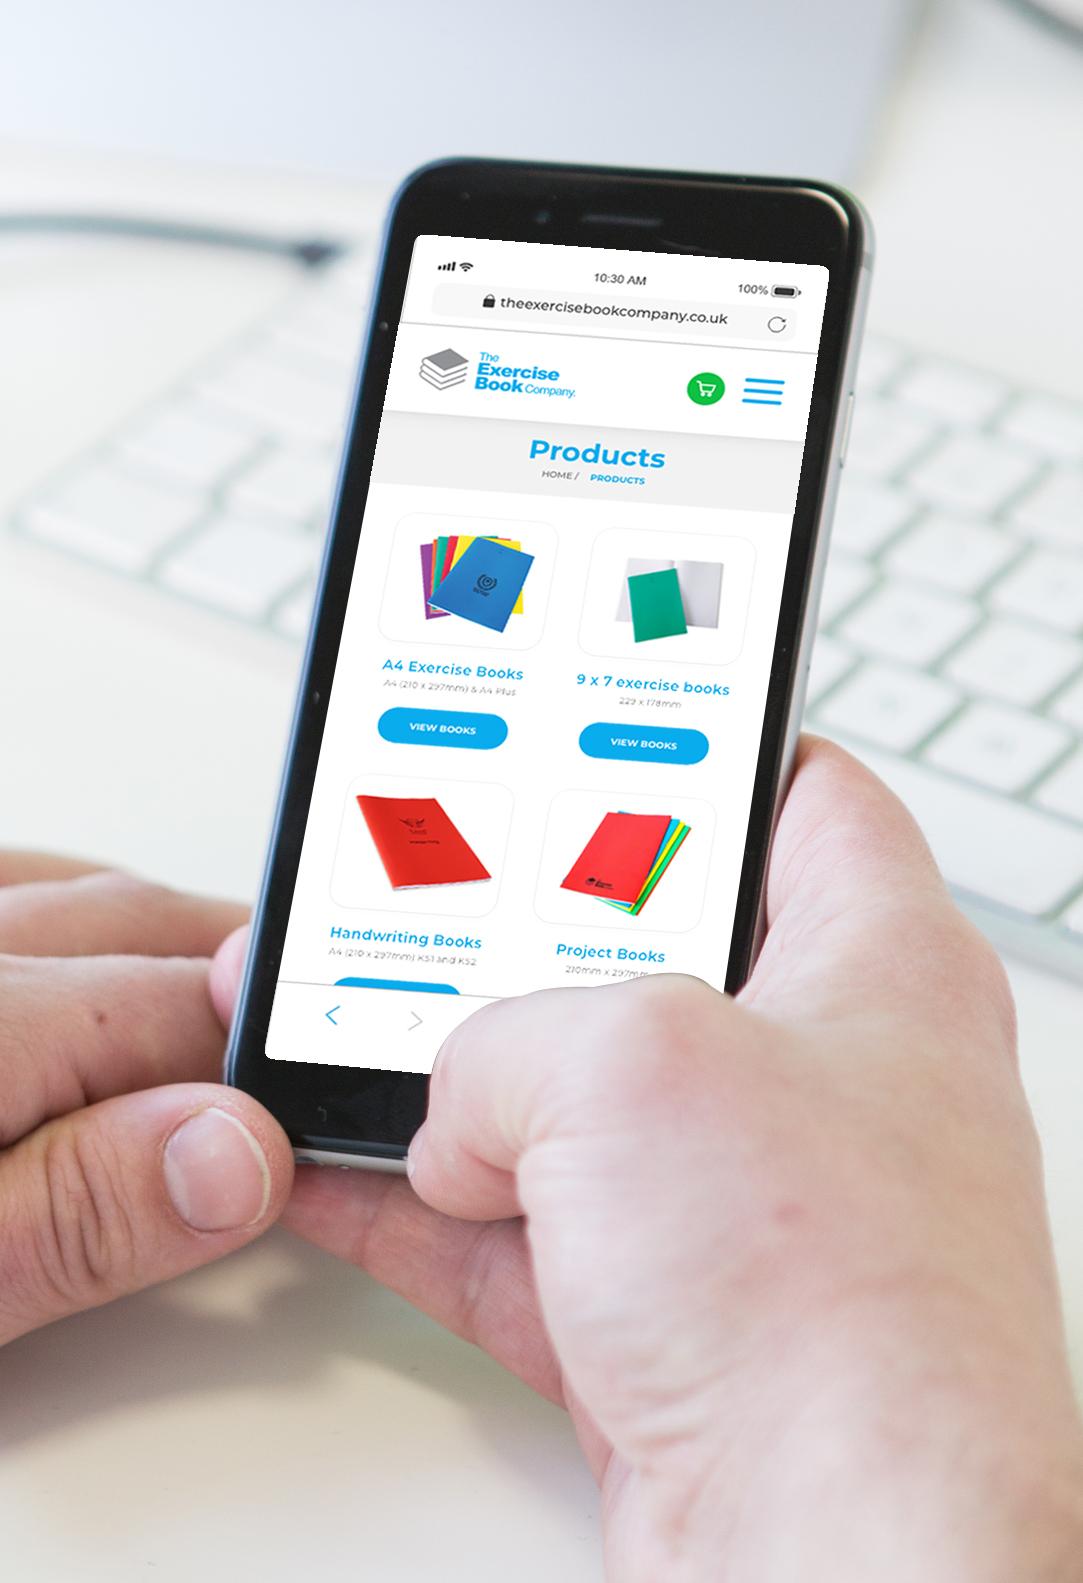 ecommerce web design - eighty3creative